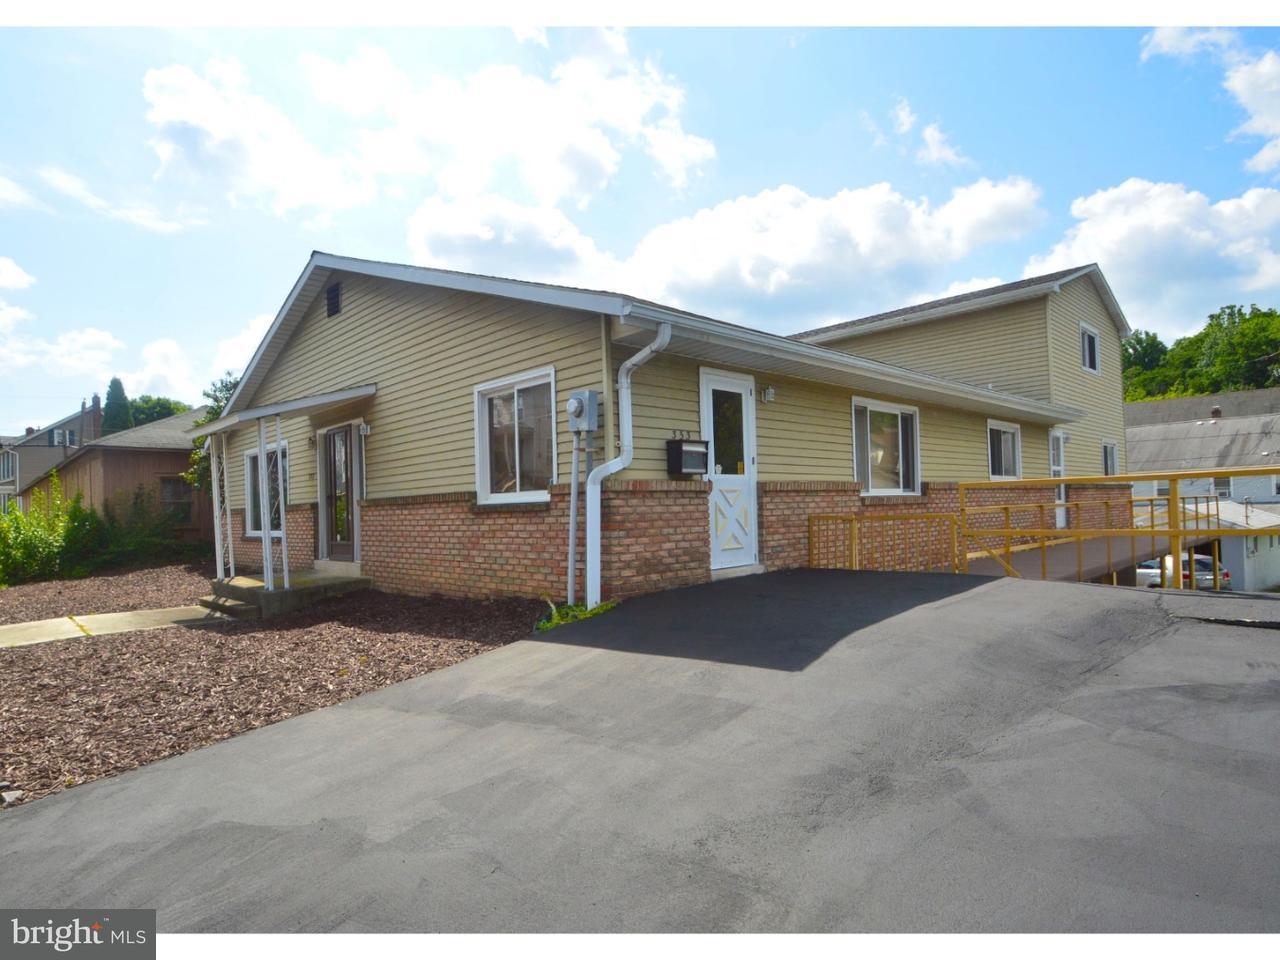 Single Family Home for Sale at 353 CHESTNUT Street Slatington, Pennsylvania 18080 United States